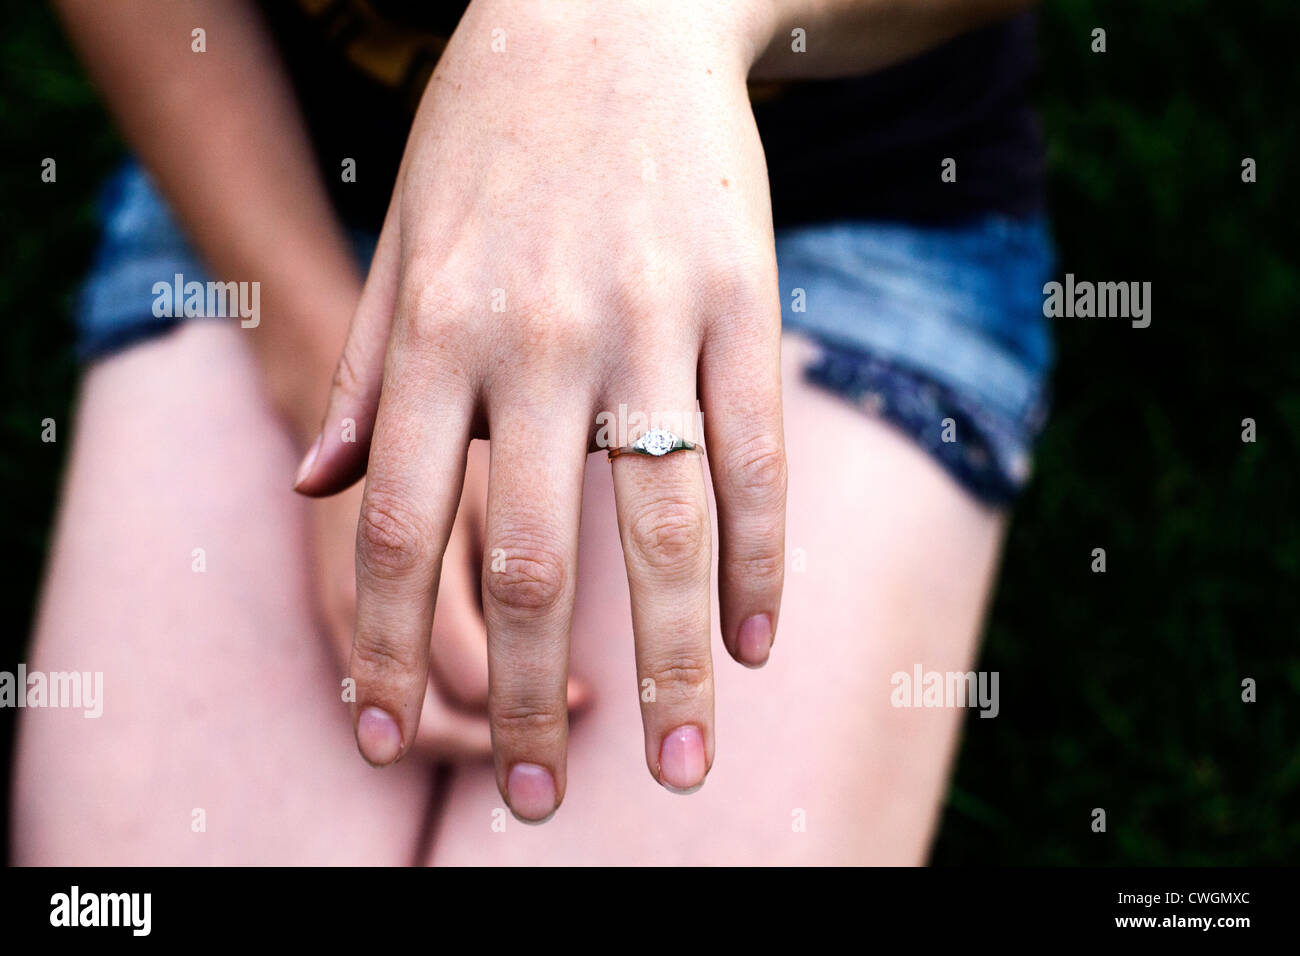 Engagement Ring New York Stock Photos & Engagement Ring New York ...